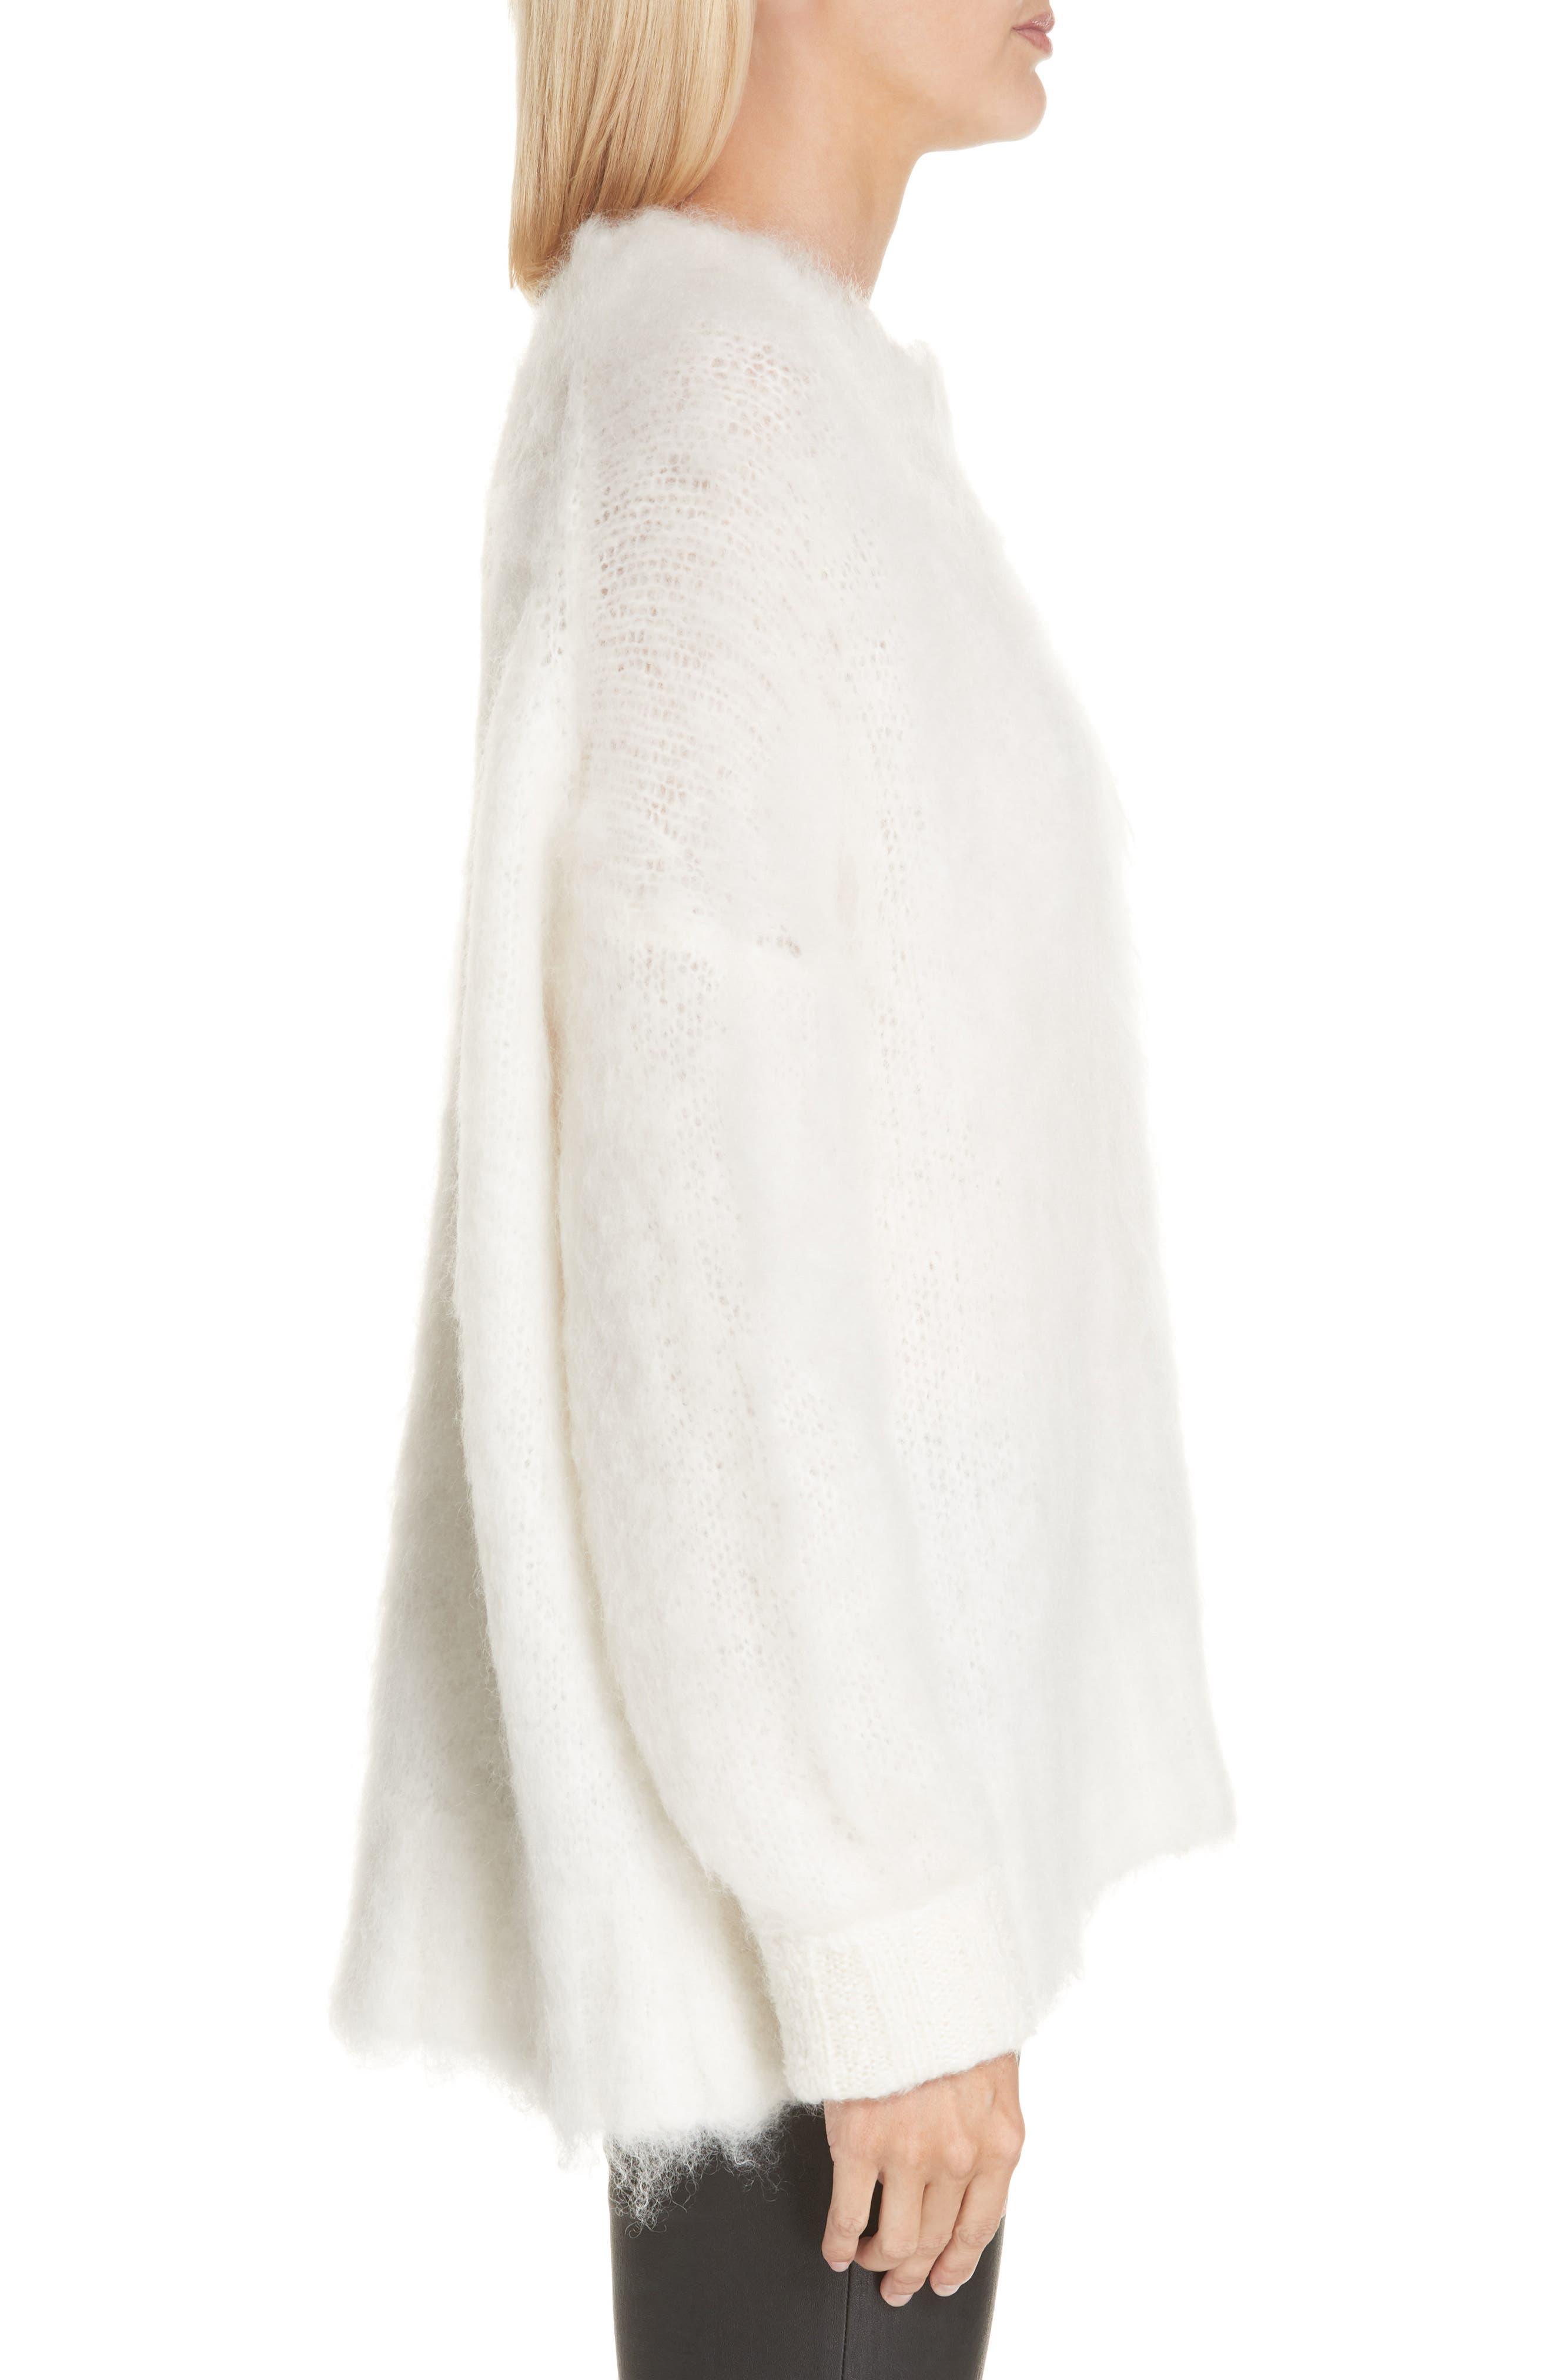 HELMUT LANG, Mohair Blend Sweater, Alternate thumbnail 3, color, NATURAL WHITE